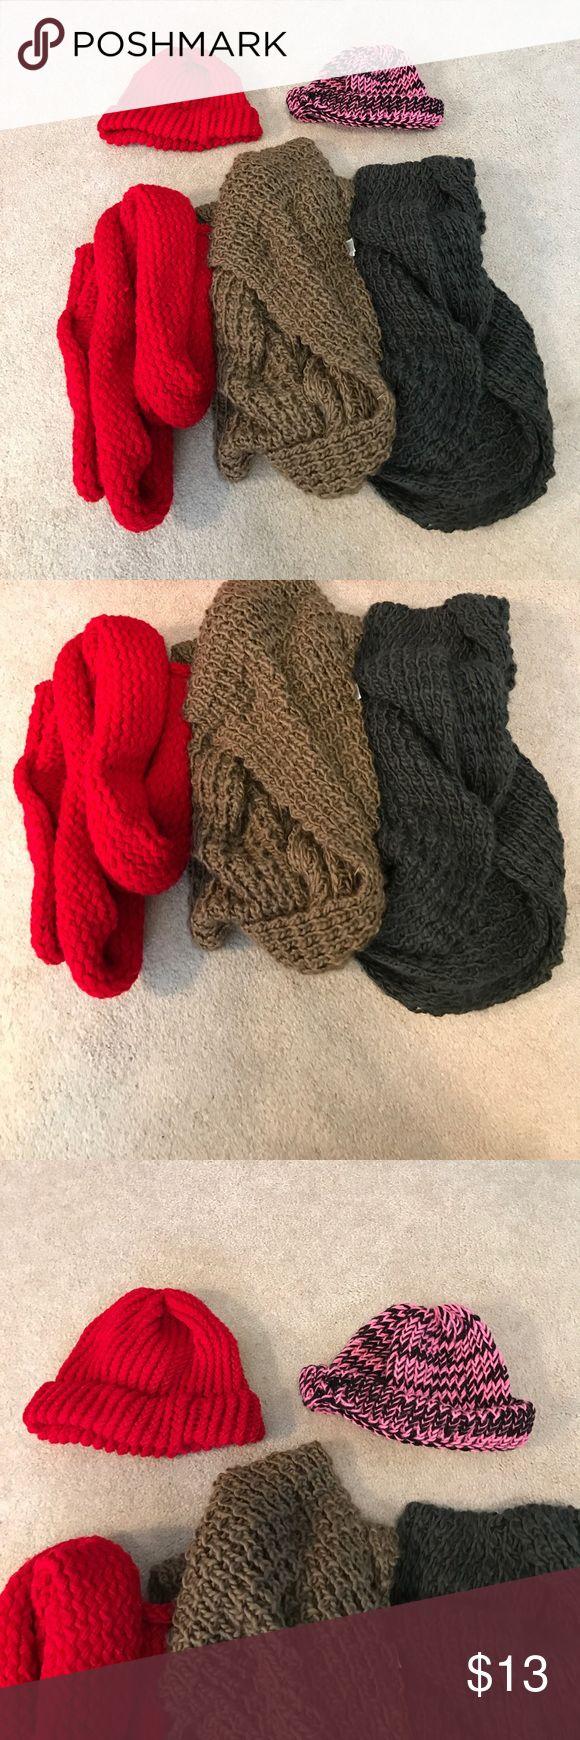 Winter scarves and hats bundle Winter scarves and hats bundle Old Navy Accessories Scarves & Wraps